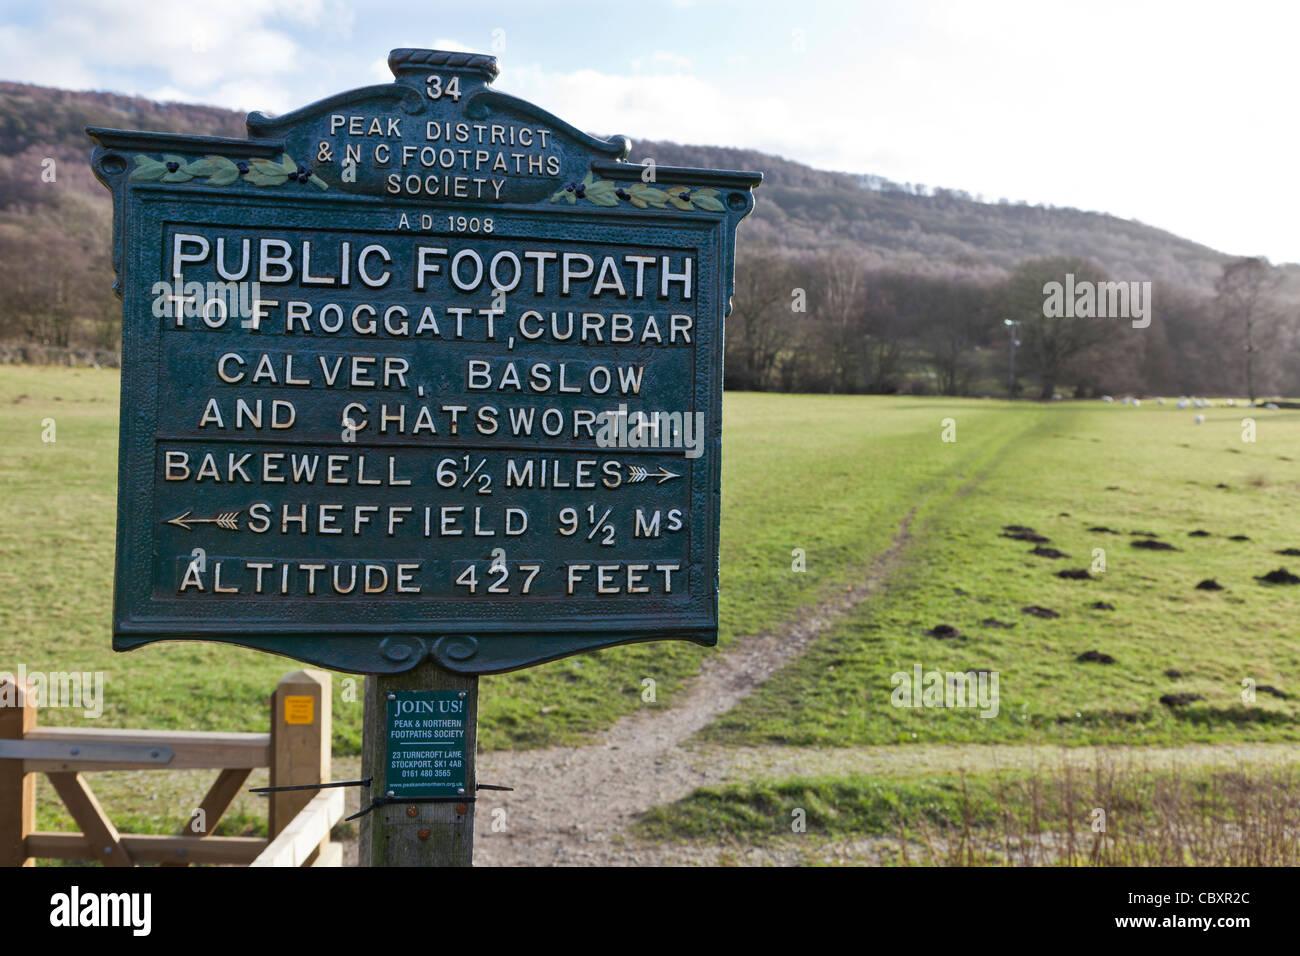 Old Public Footpath sign, Froggatt, Derbyshire - Stock Image